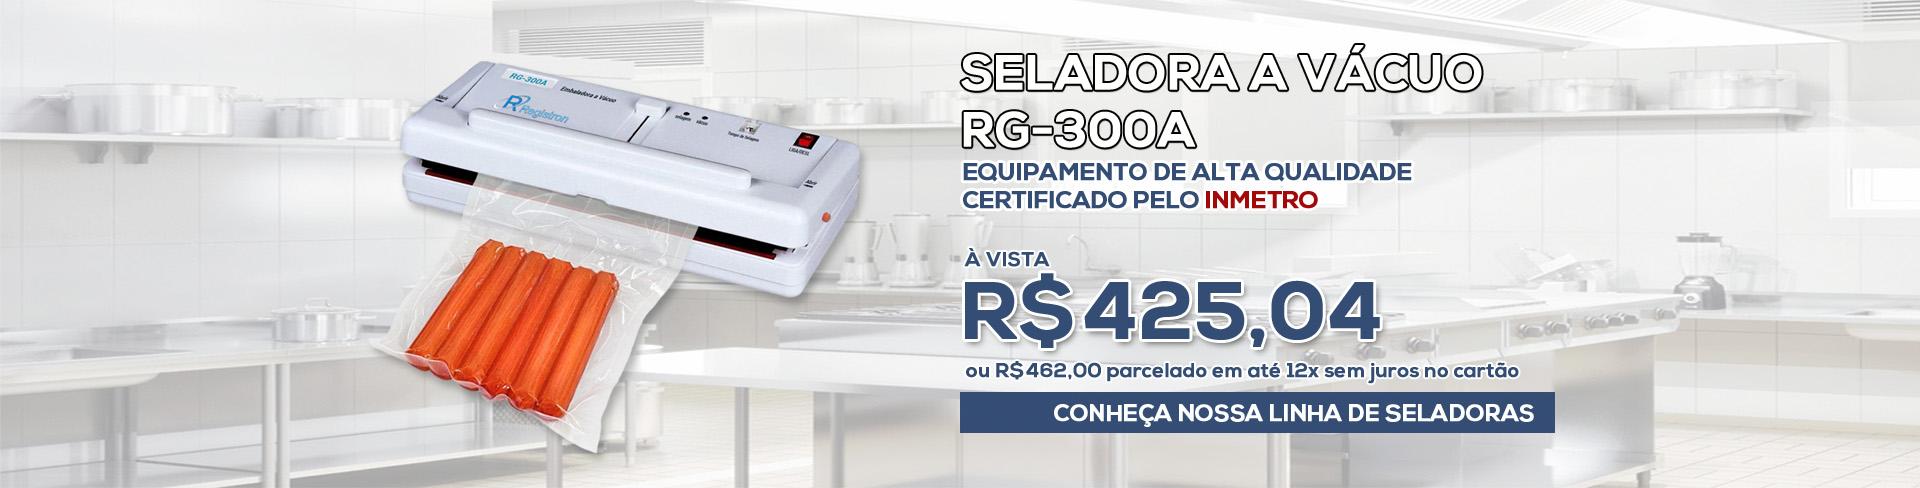 Seladora a Vácuo RG-300A